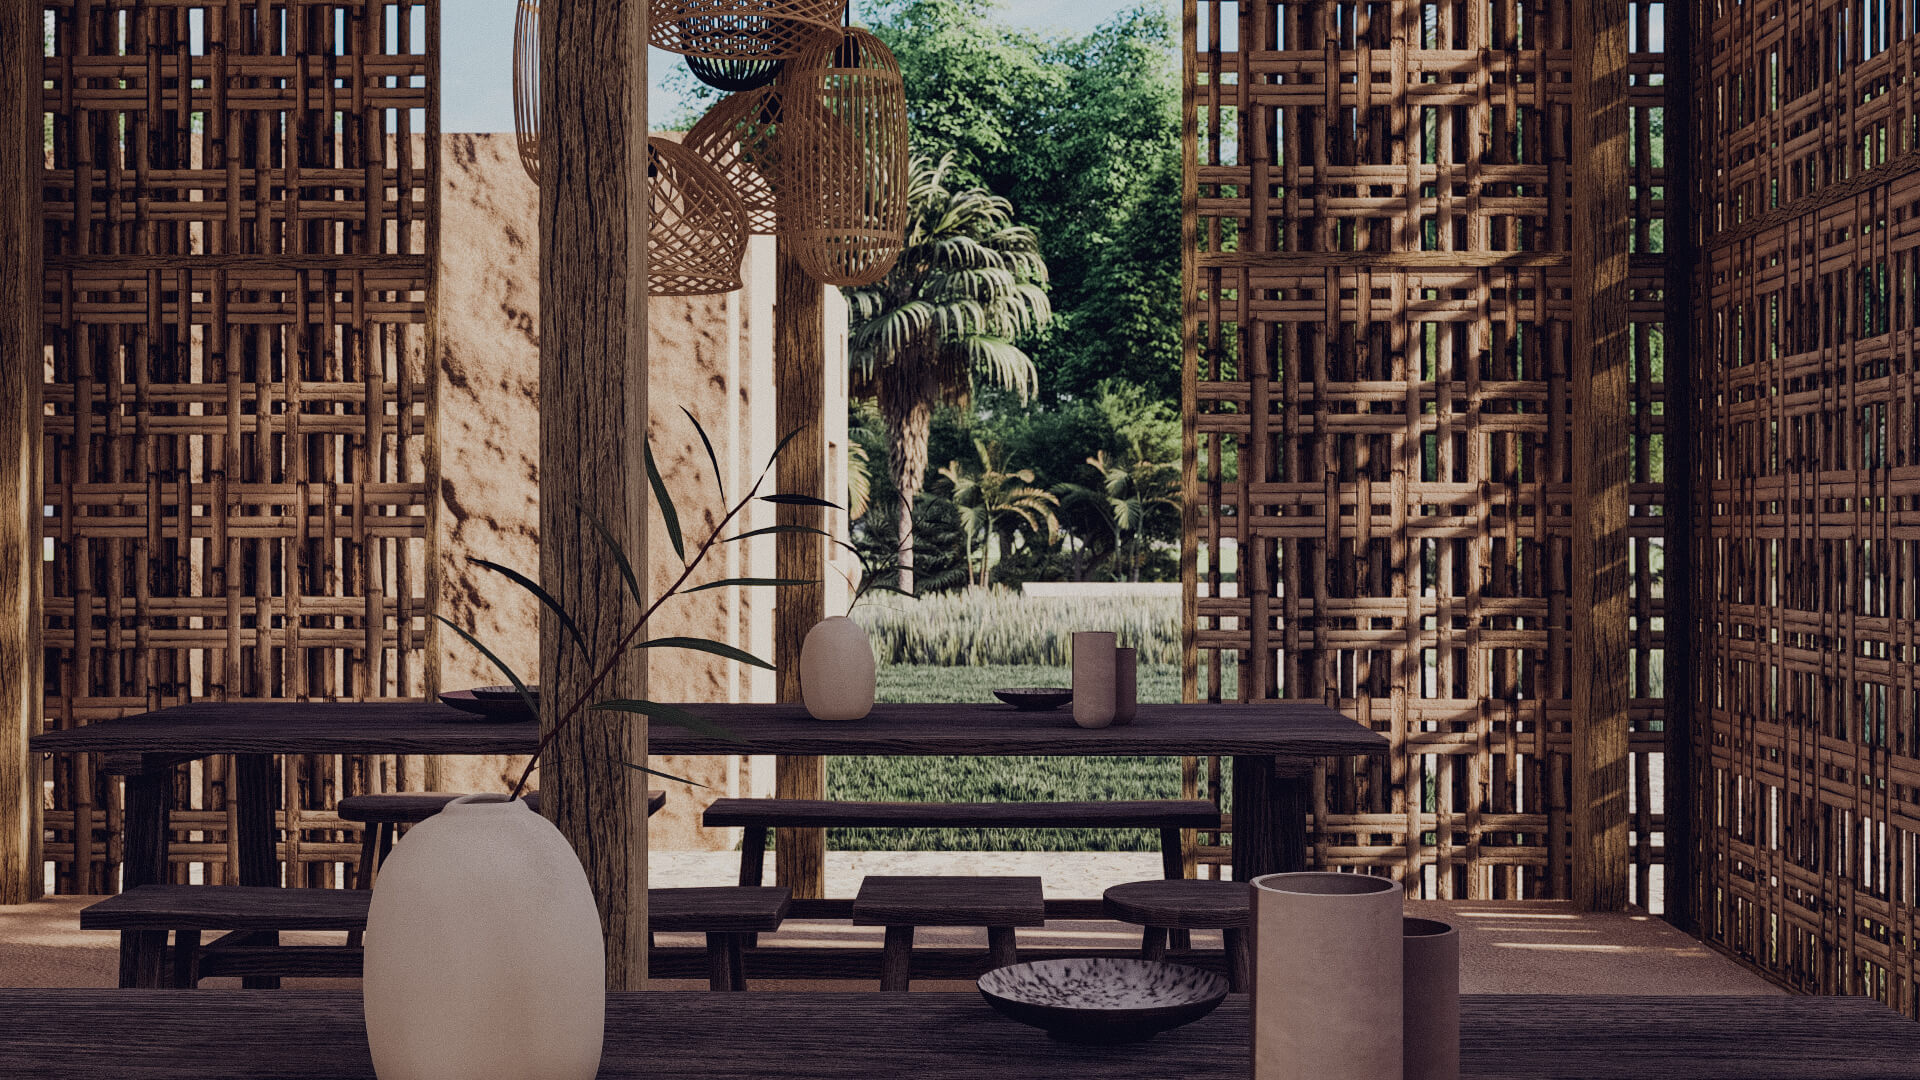 Rumah Besar Sembalun Lombok Architecture Restaurant and Cafe